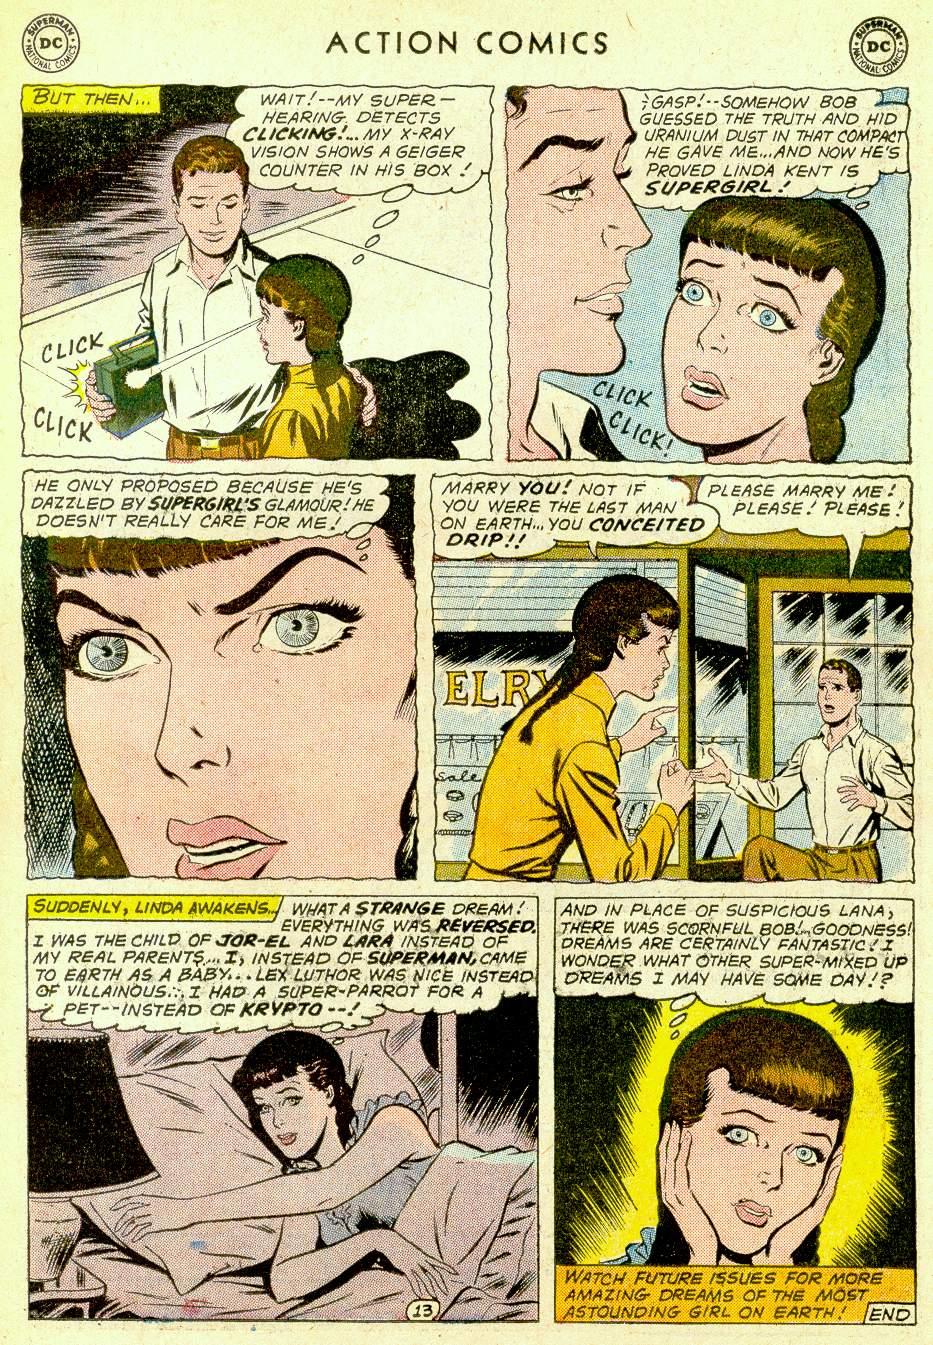 Action Comics (1938) 275 Page 30